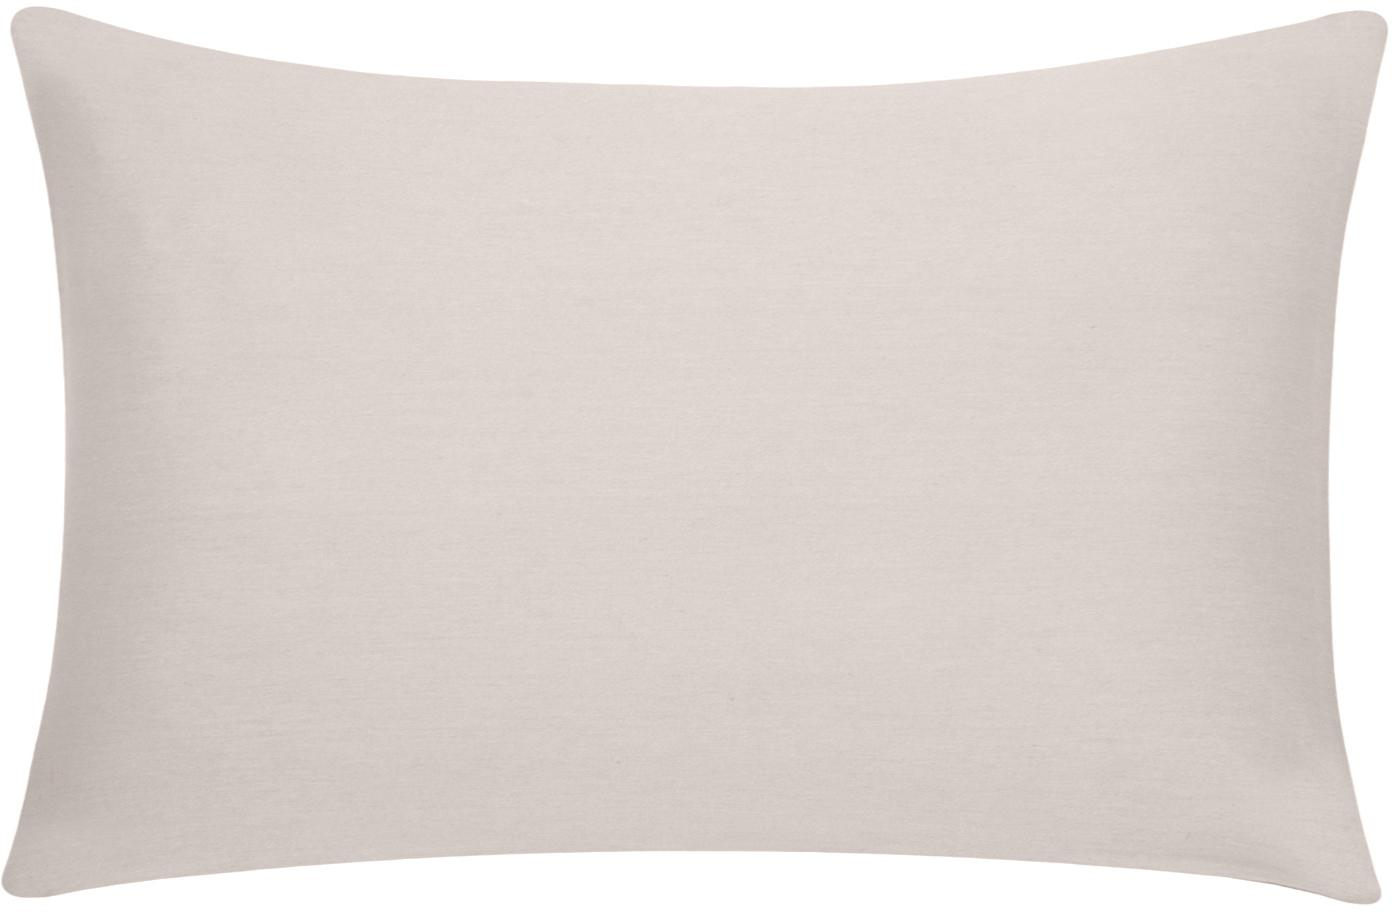 Baumwoll-Kissenhülle Mads in Beige, 100% Baumwolle, Beige, 30 x 50 cm